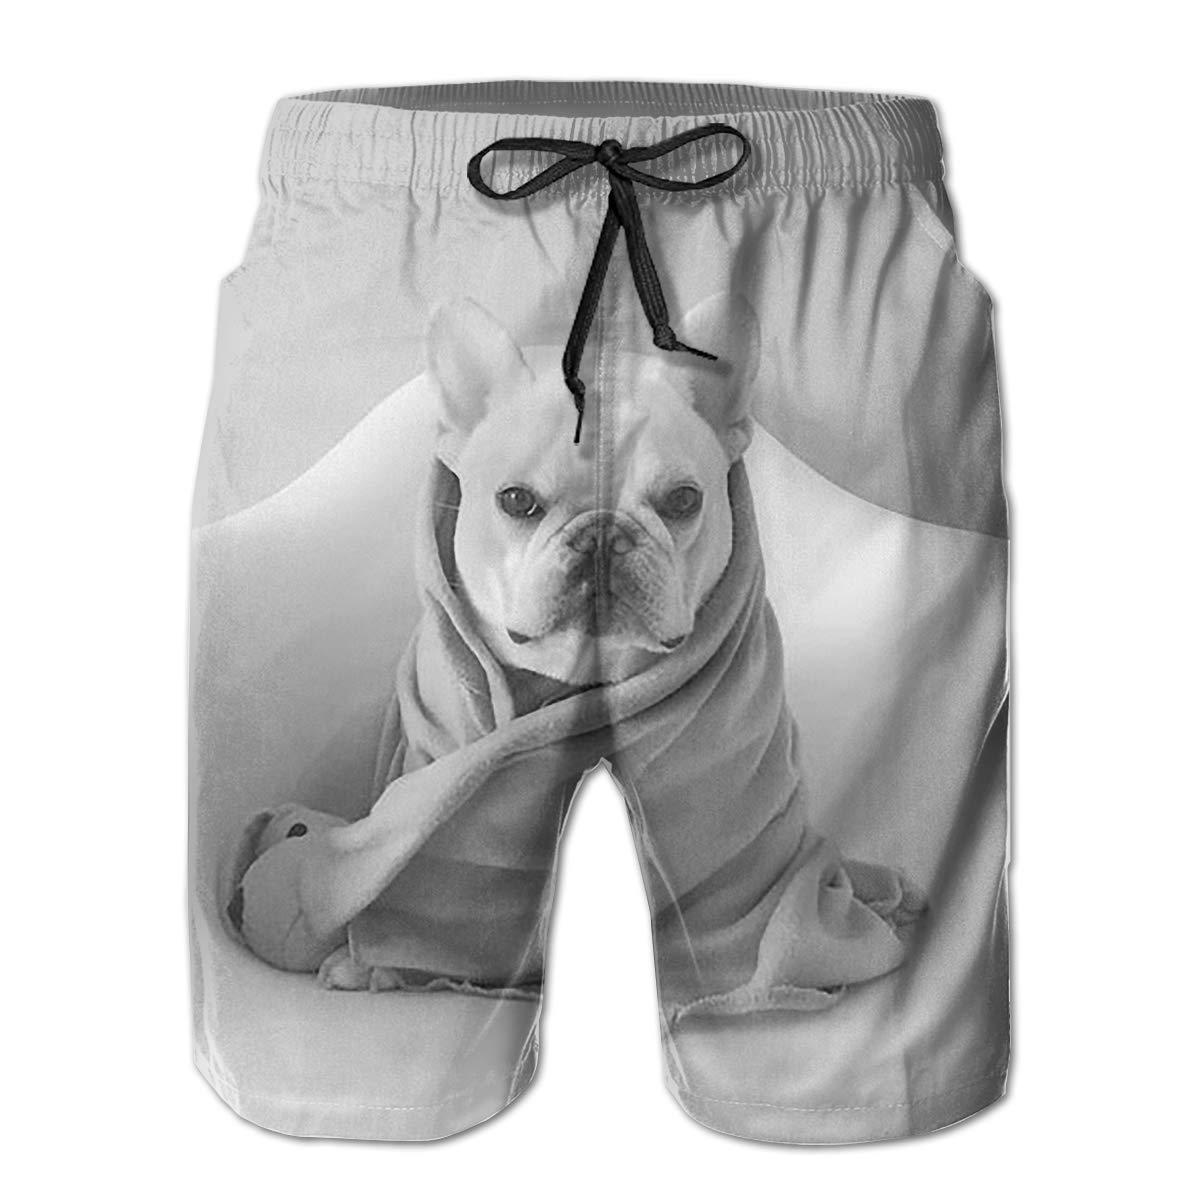 Tyugvvo French Bulldog Funny Swim Trunks Quick Dry Beachwear Sports Running Swim Board Shorts Mesh Lining